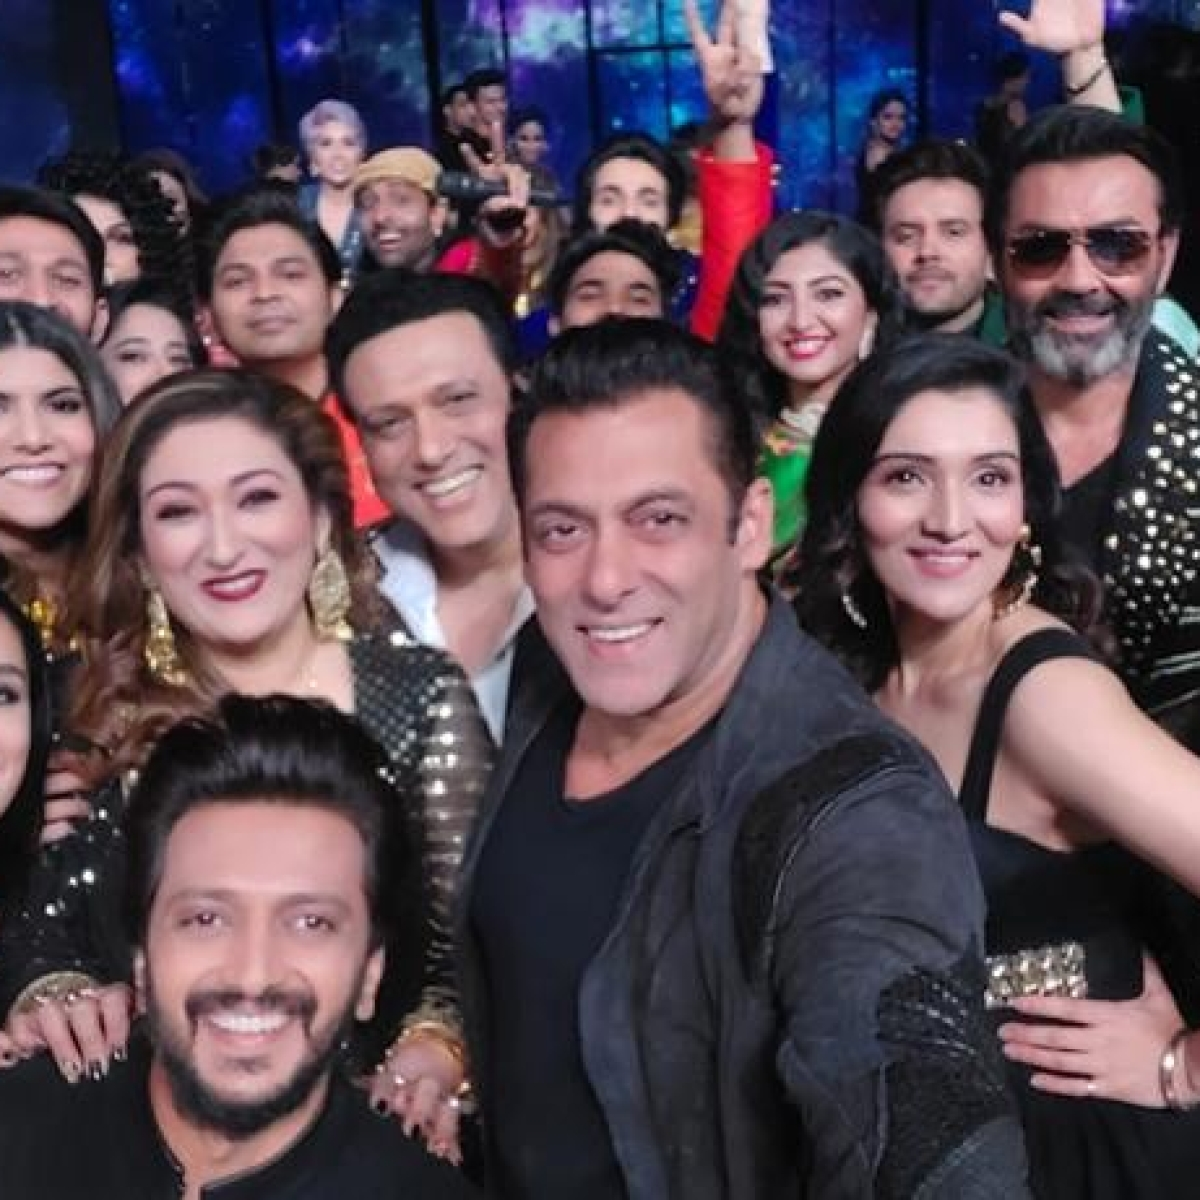 Check out Salman Khan's 'mega selfie' featuring Govinda, Bobby Deol, Shraddha Kapoor, Rajkummar Rao, and more